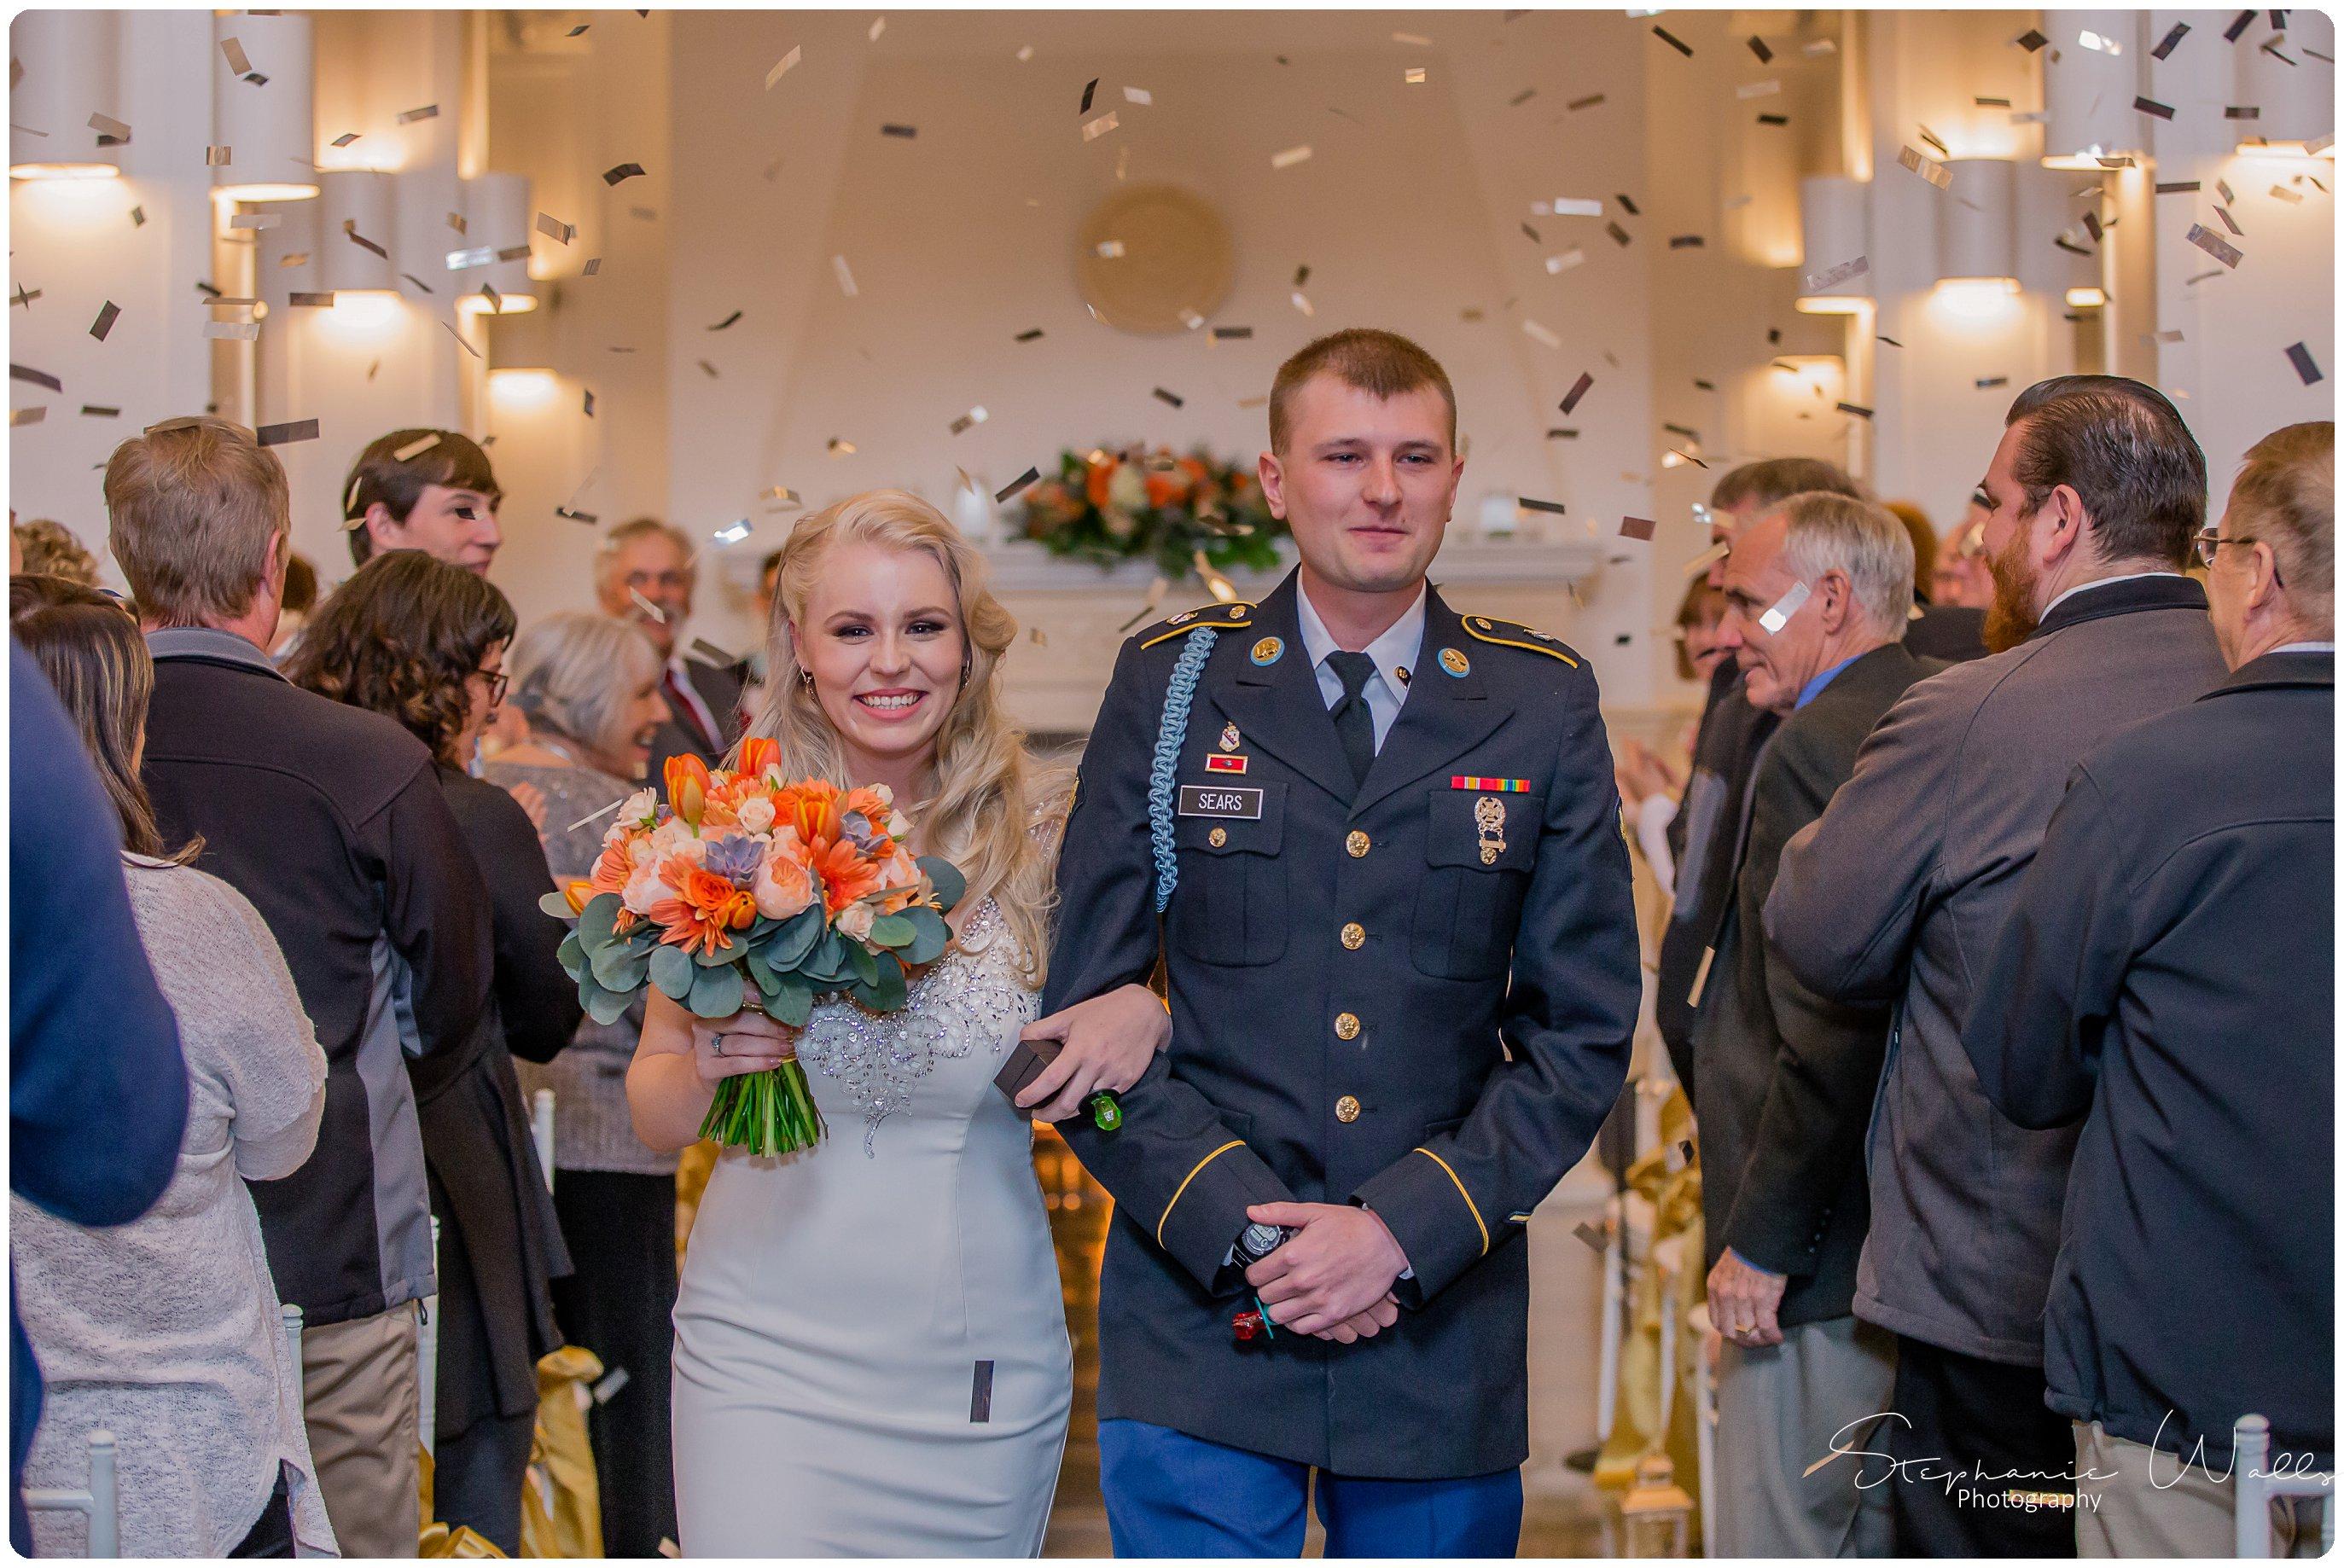 Sears Ceremony 219 The Hero & The Starlet | Monte Cristo Ballroom | Stephanie Walls Photography Weddings